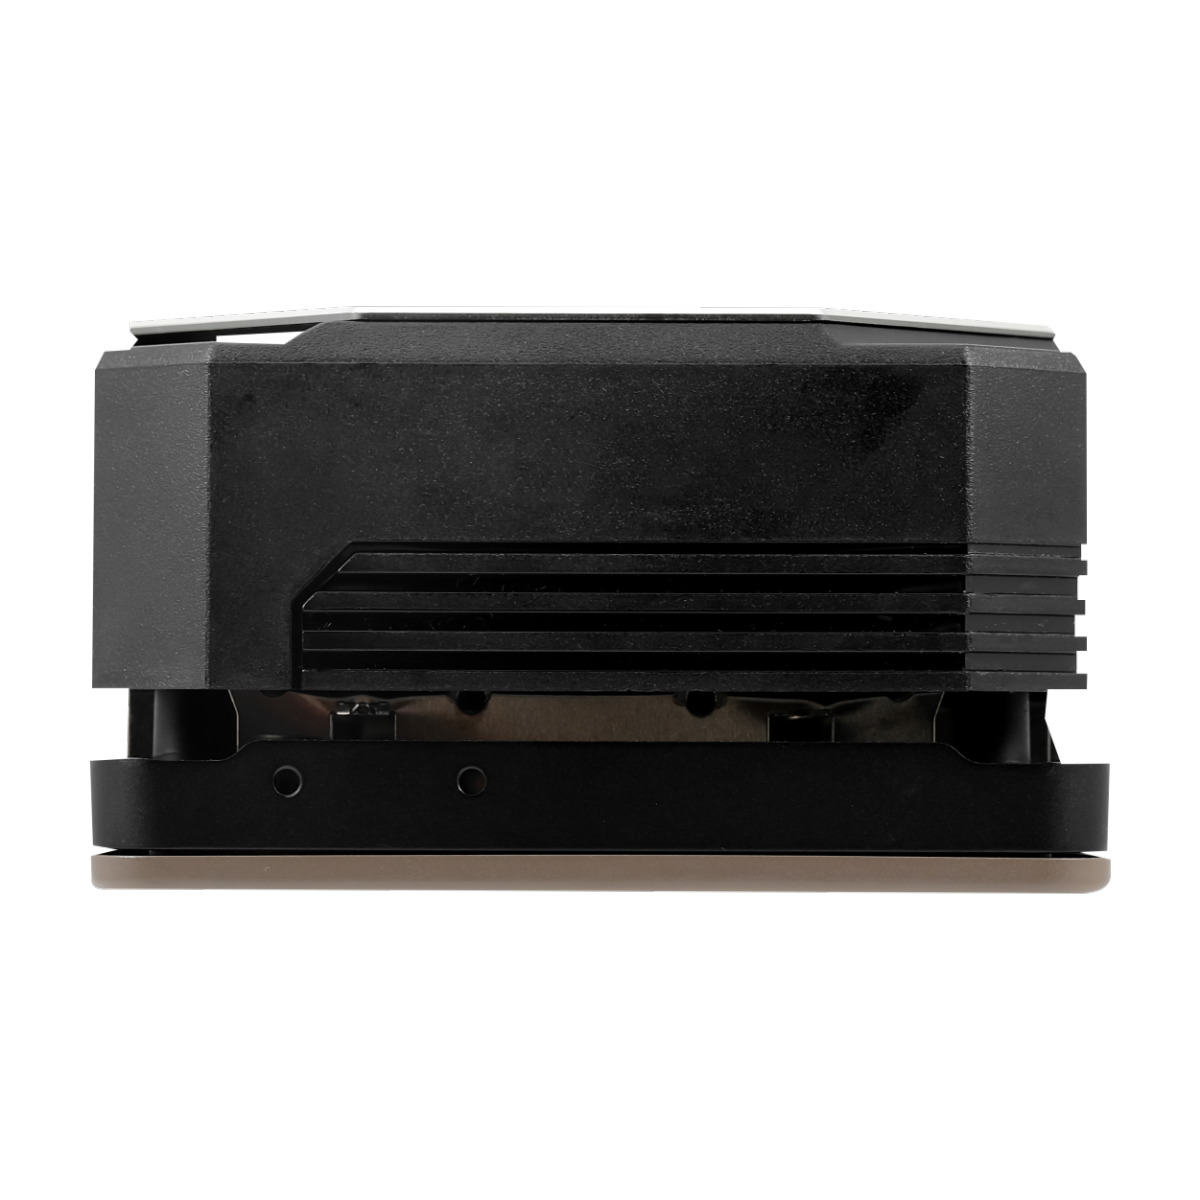 Placa de Vídeo Palit NVIDIA GeForce RTX 3080 GamingPro, 10GB, GDDR6X, 320bit, NED3080019IA-132AA